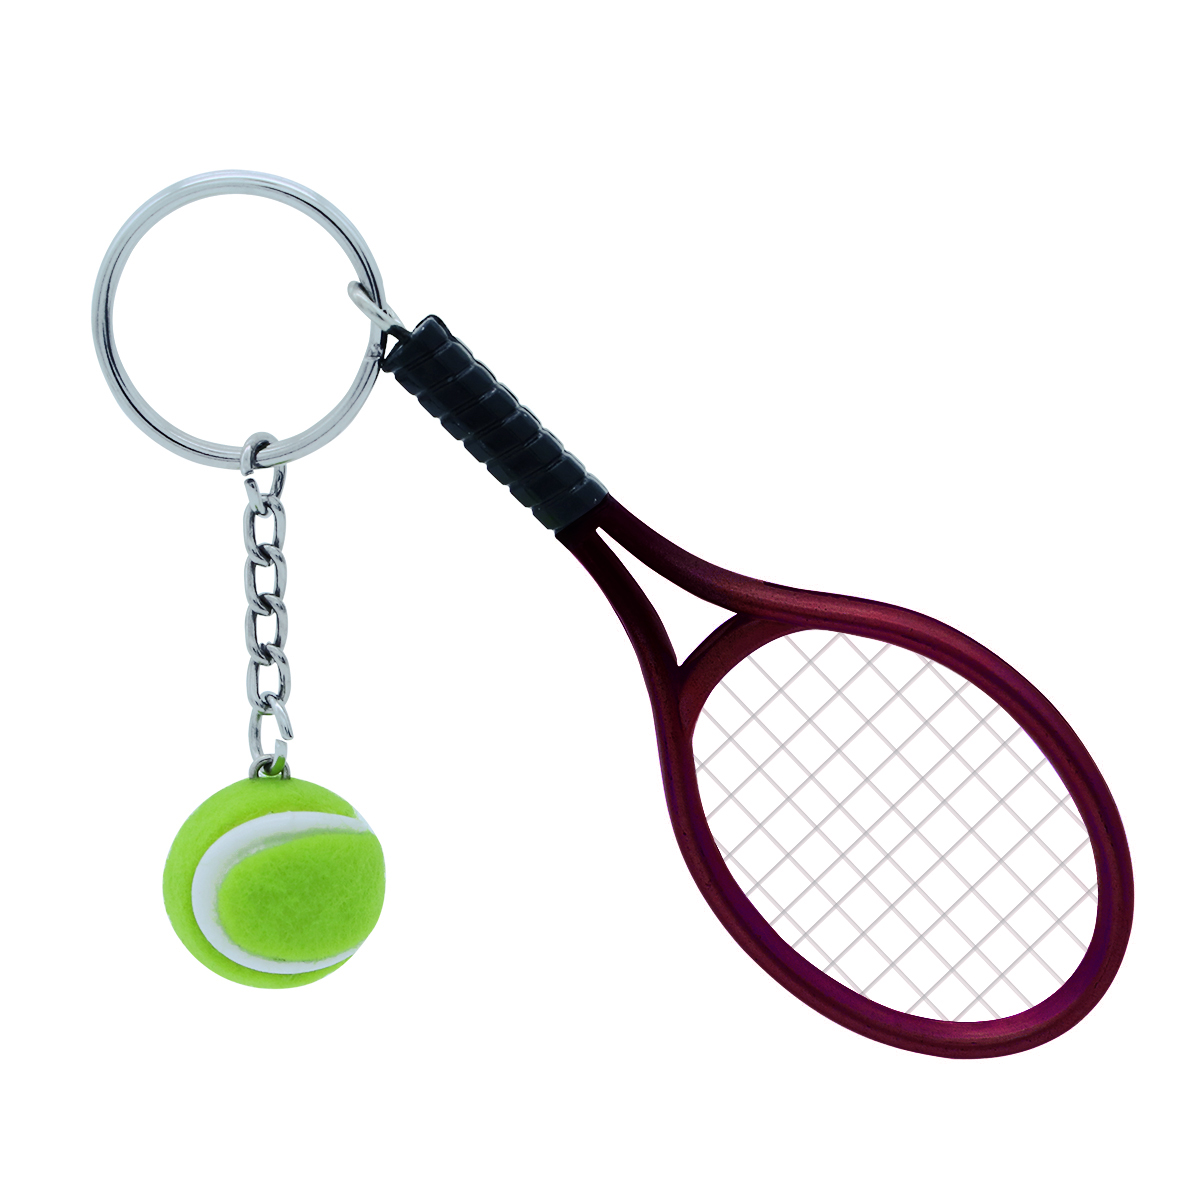 Audacious Mini Tennis Racket Keychain Key Ring Cute Sport Charm Tennis Ball Key Chain Car Bag Pendant Keyring Gift (dark Red) Demand Exceeding Supply